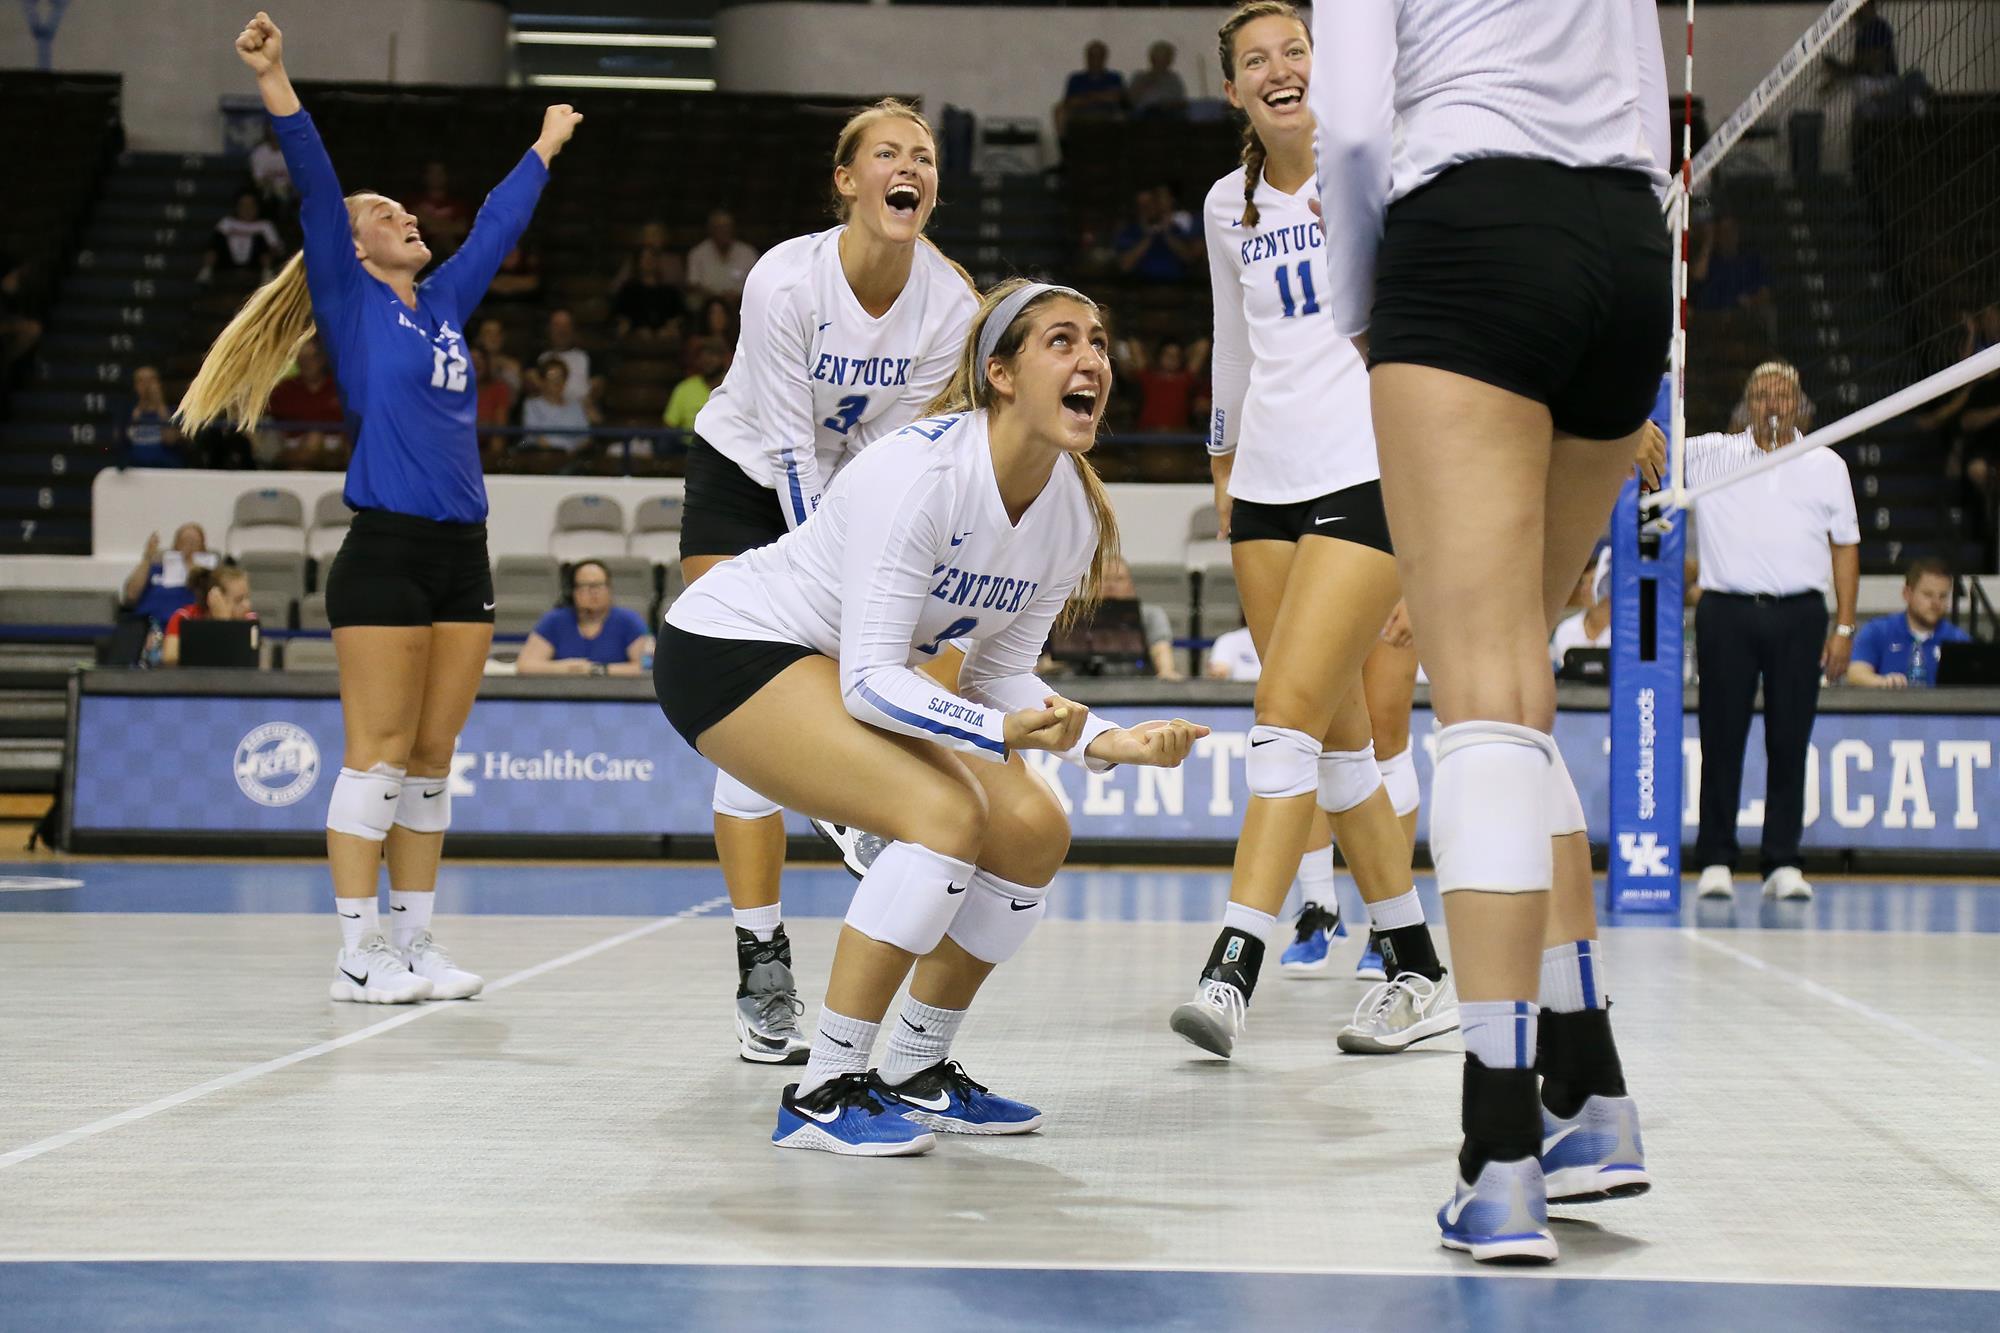 Kylie Schmaltz Volleyball University Of Kentucky Athletics